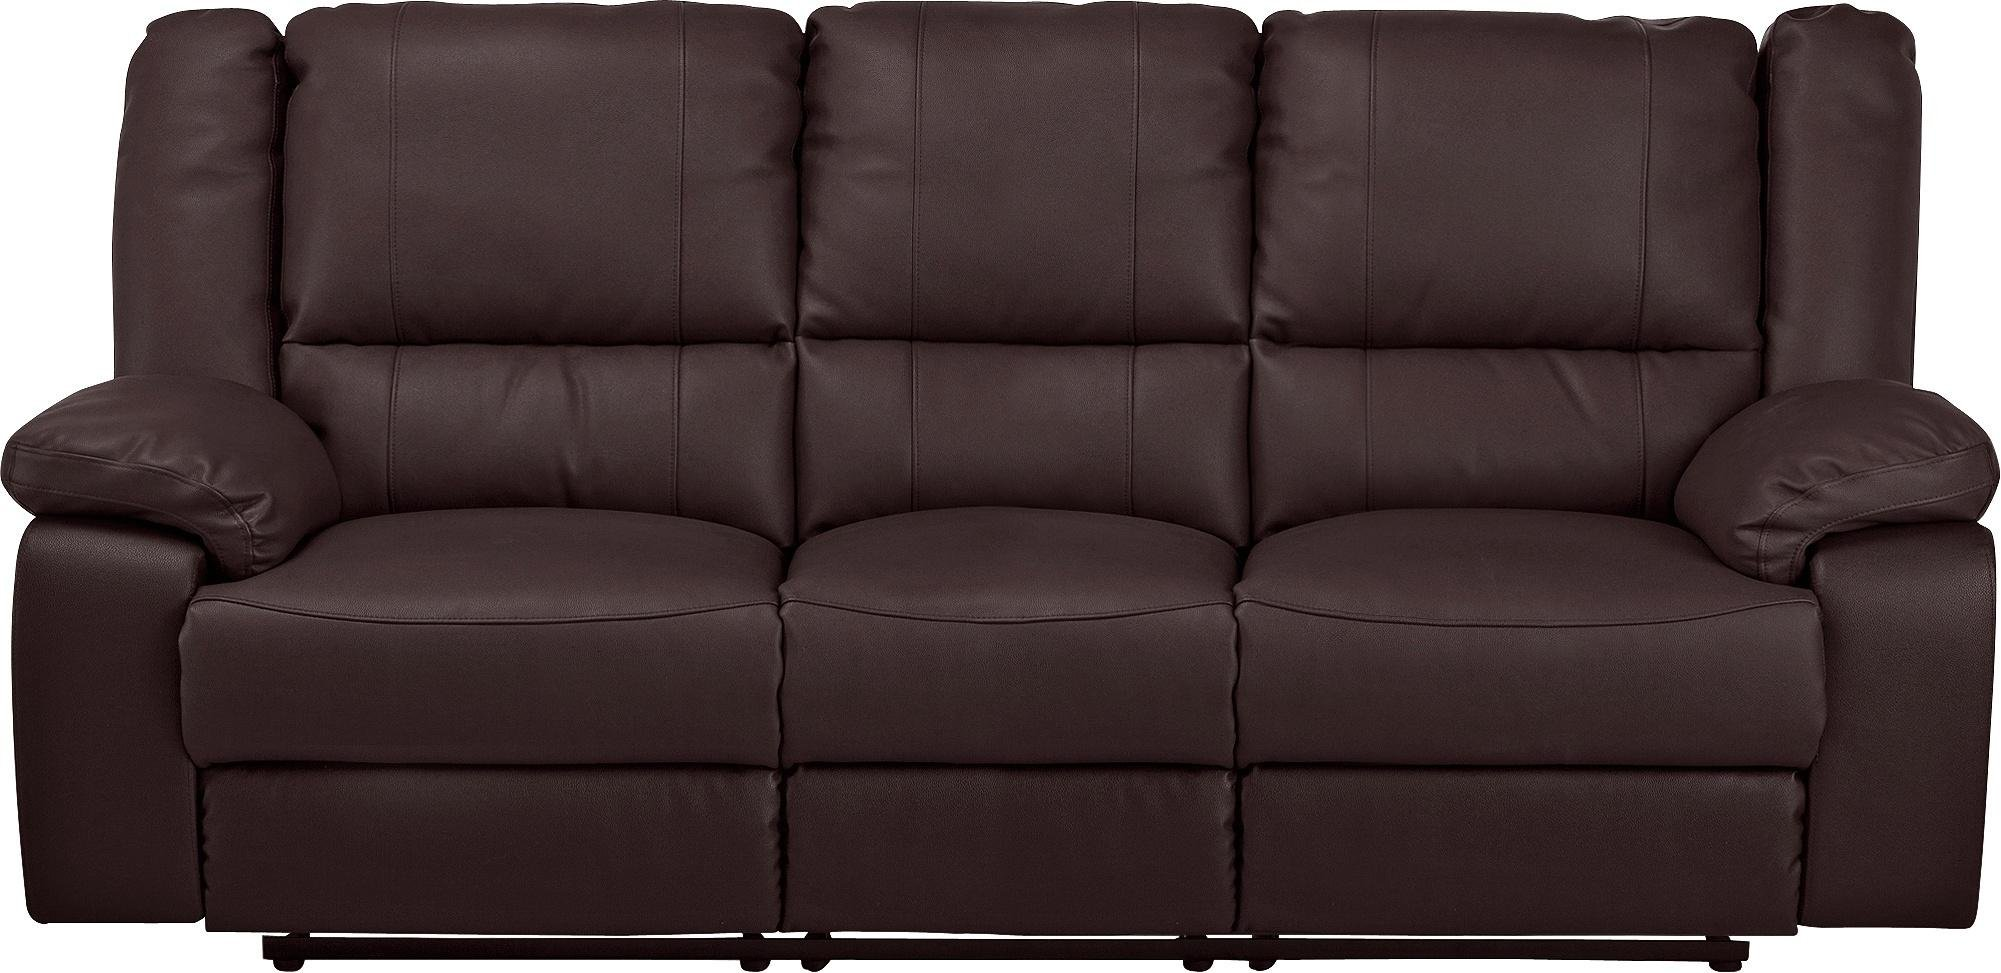 recliner sofas  sc 1 st  Argos & Results for recliner sofas islam-shia.org